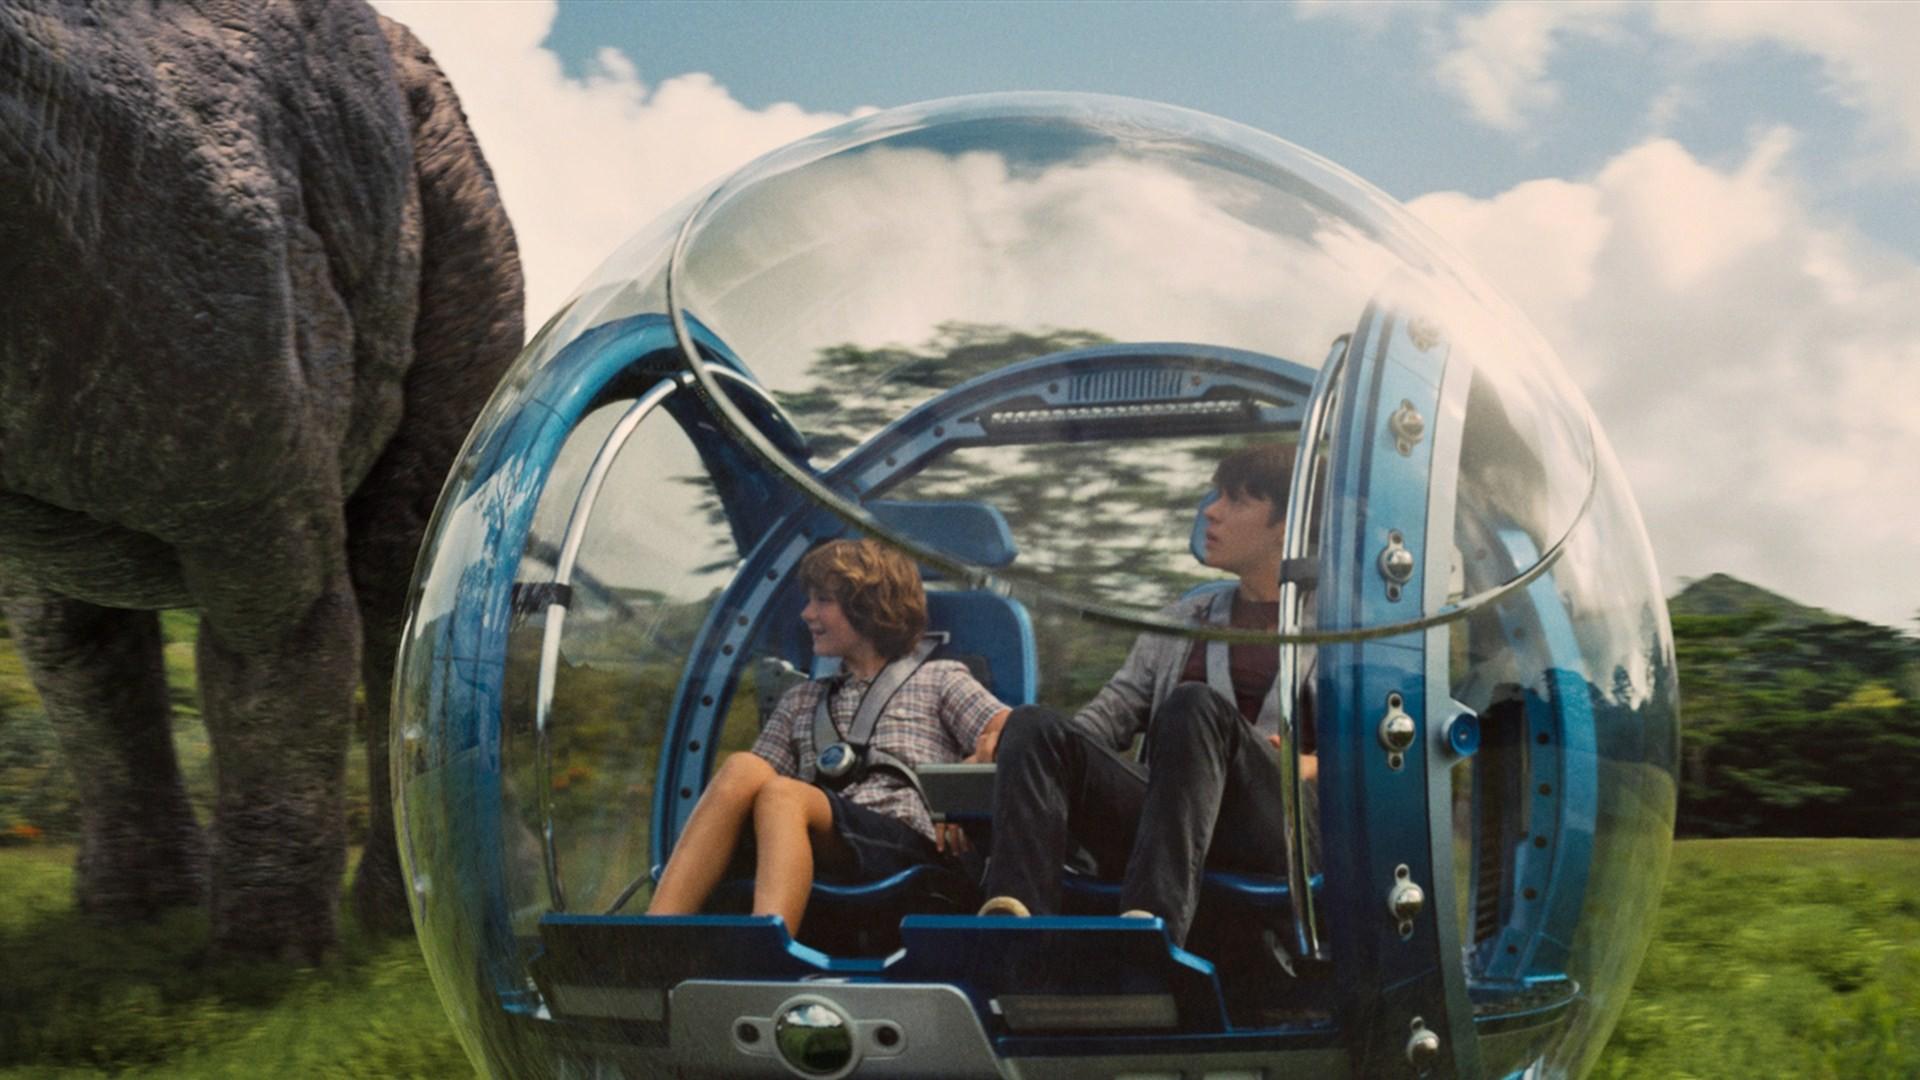 O Carro-Bolha - Jurassic Park